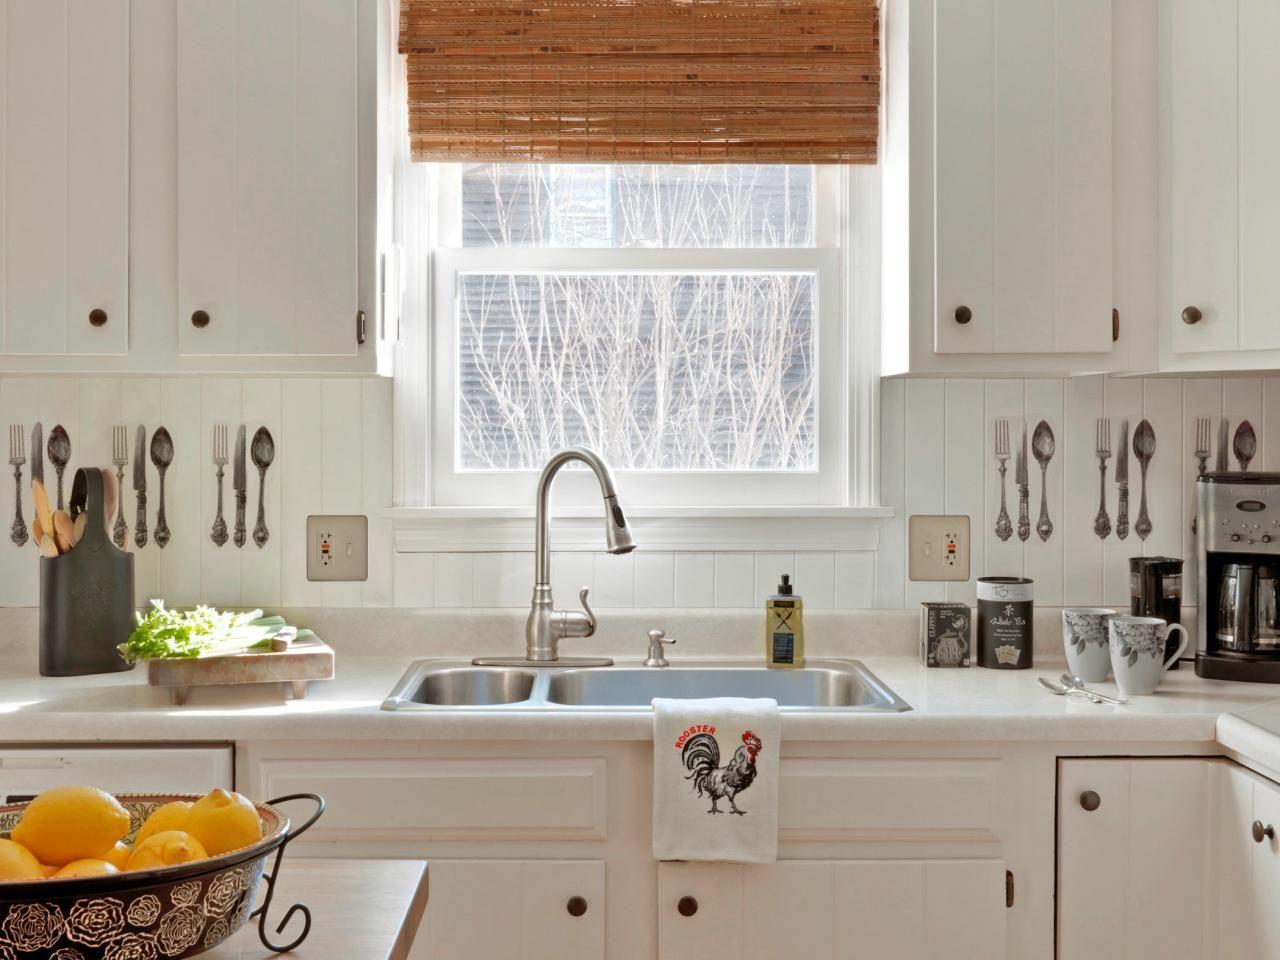 Cottage Kitchen Backsplash Ideas Part - 15: How To Make A Beadboard Backsplash With Vintage Artwork. White Cottage  KitchensKitchens ...